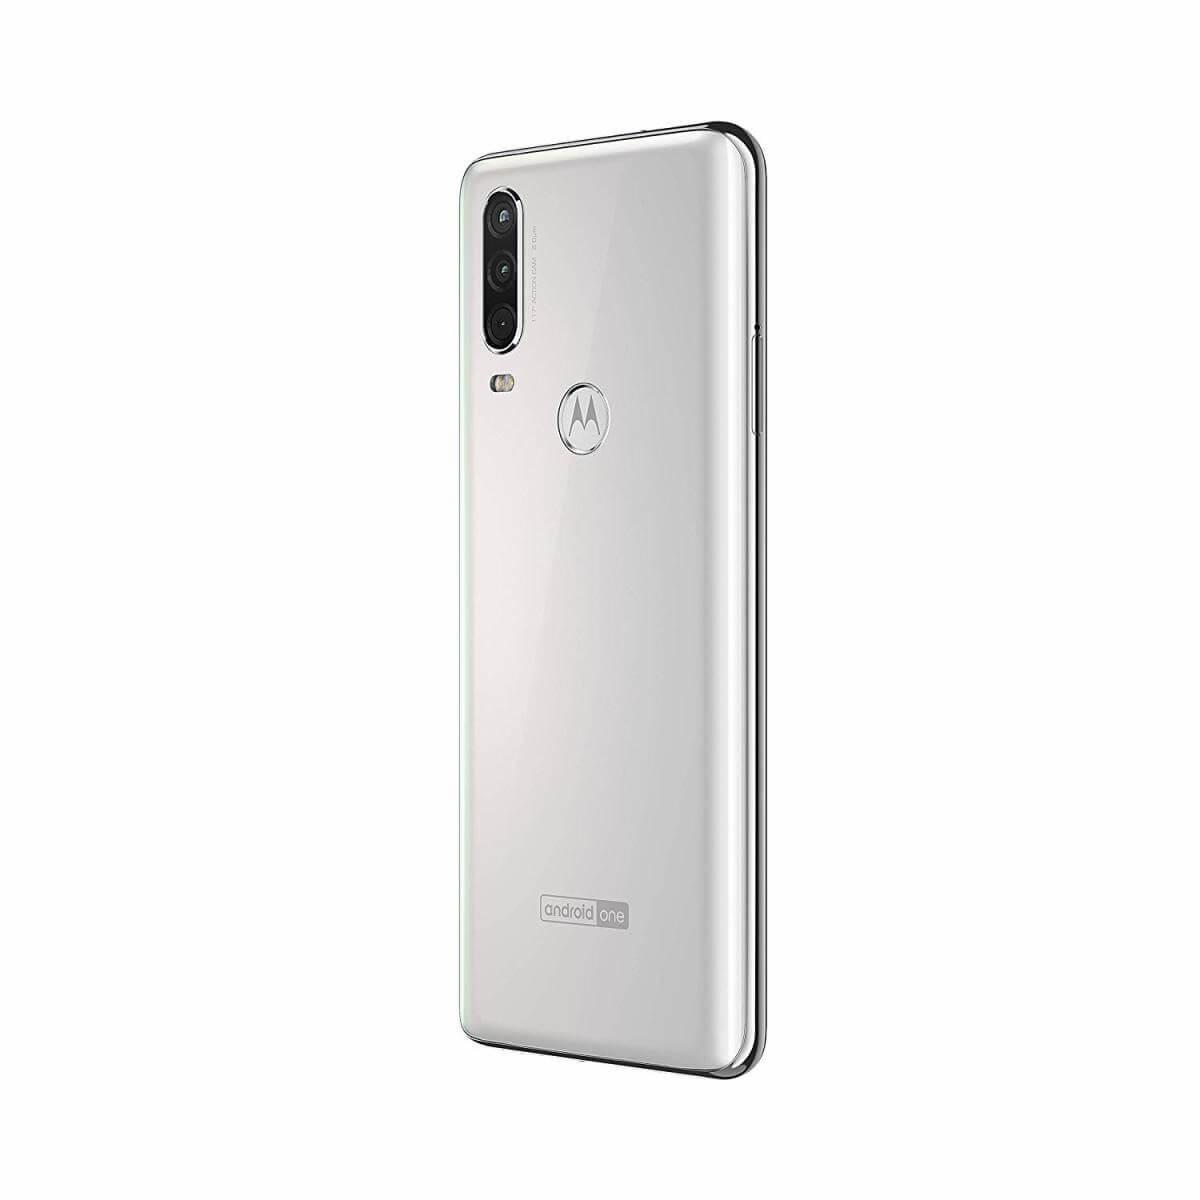 Motorola One Action: Smartphone mit